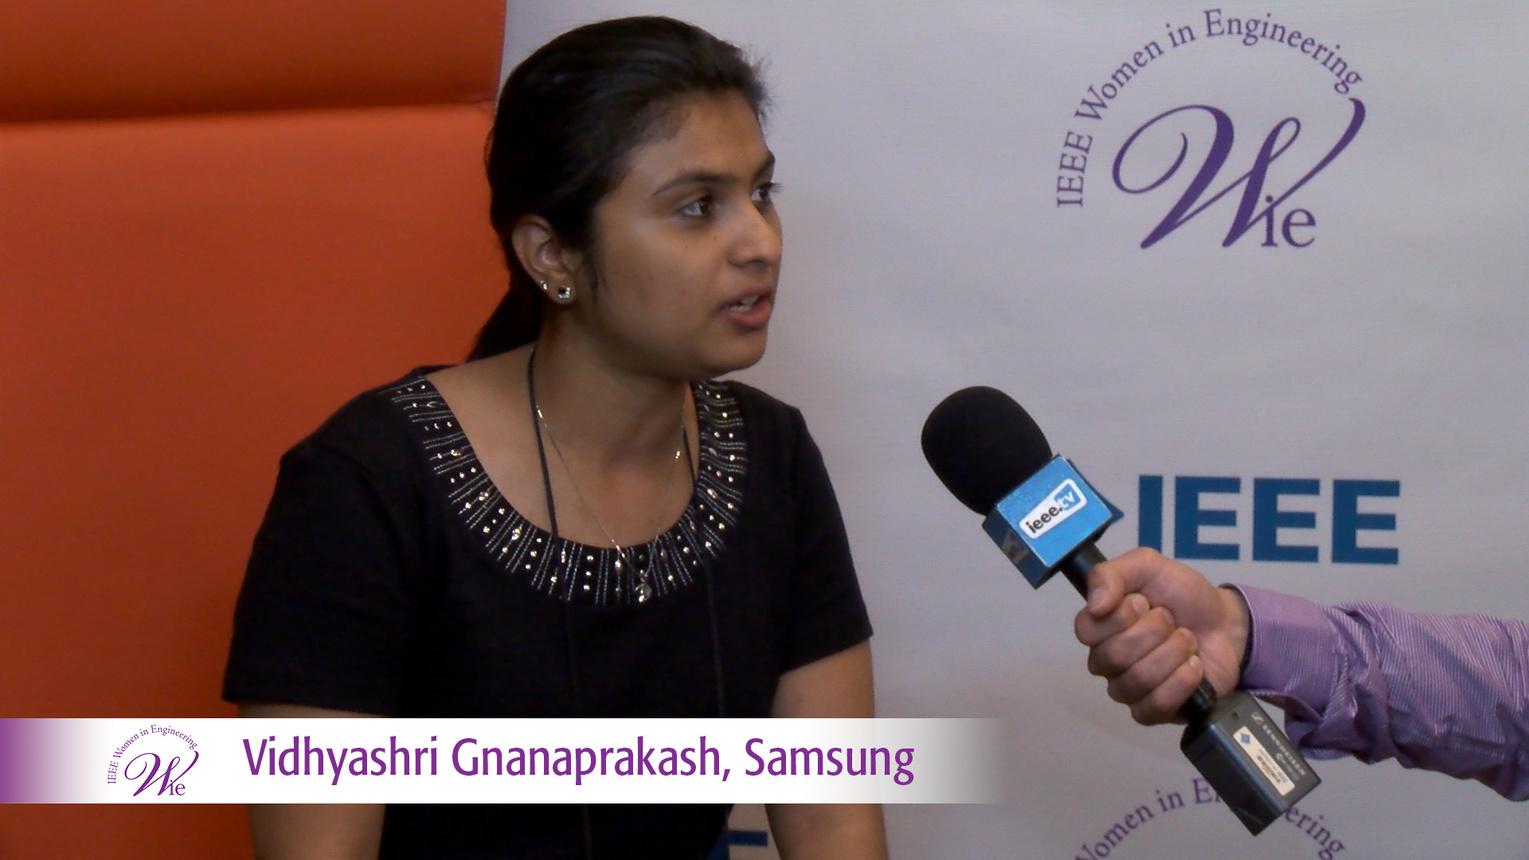 Vidhyashri Gnanaprakash from Samsung at WIE ILC 2016